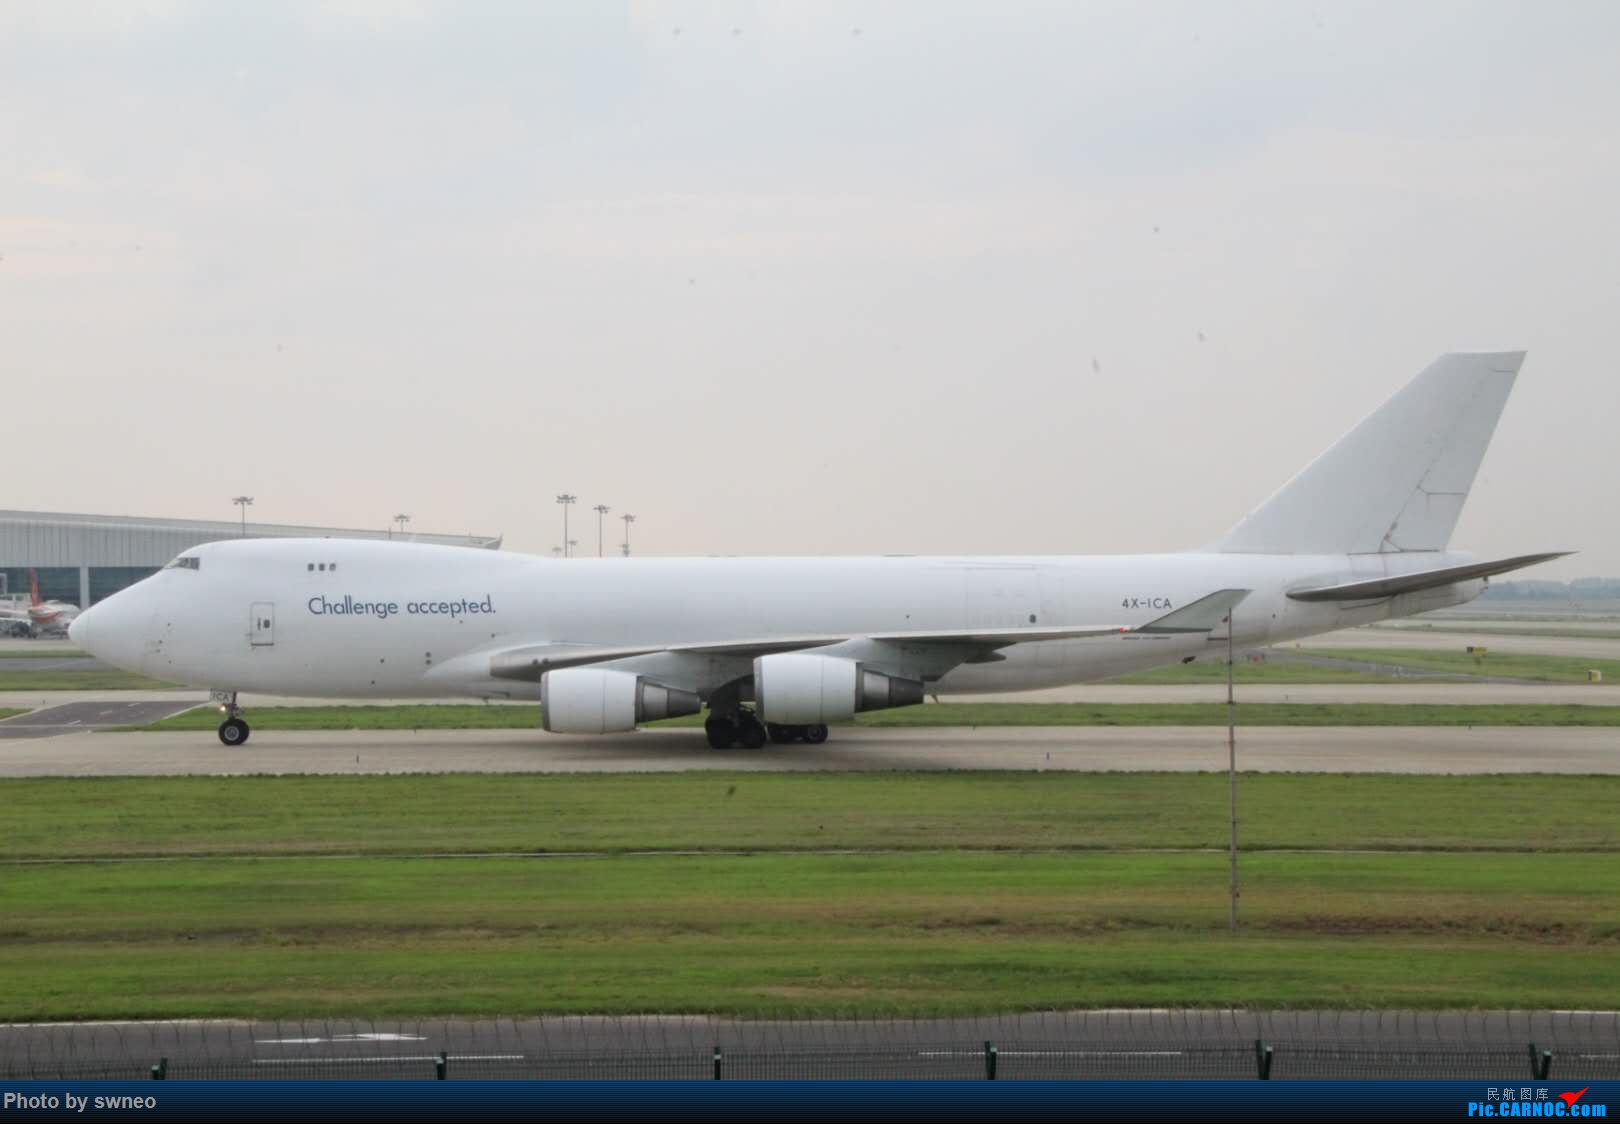 Re:[原创]CGO萌新拍机 BOEING 747-400F 4X-ICA 中国郑州新郑国际机场